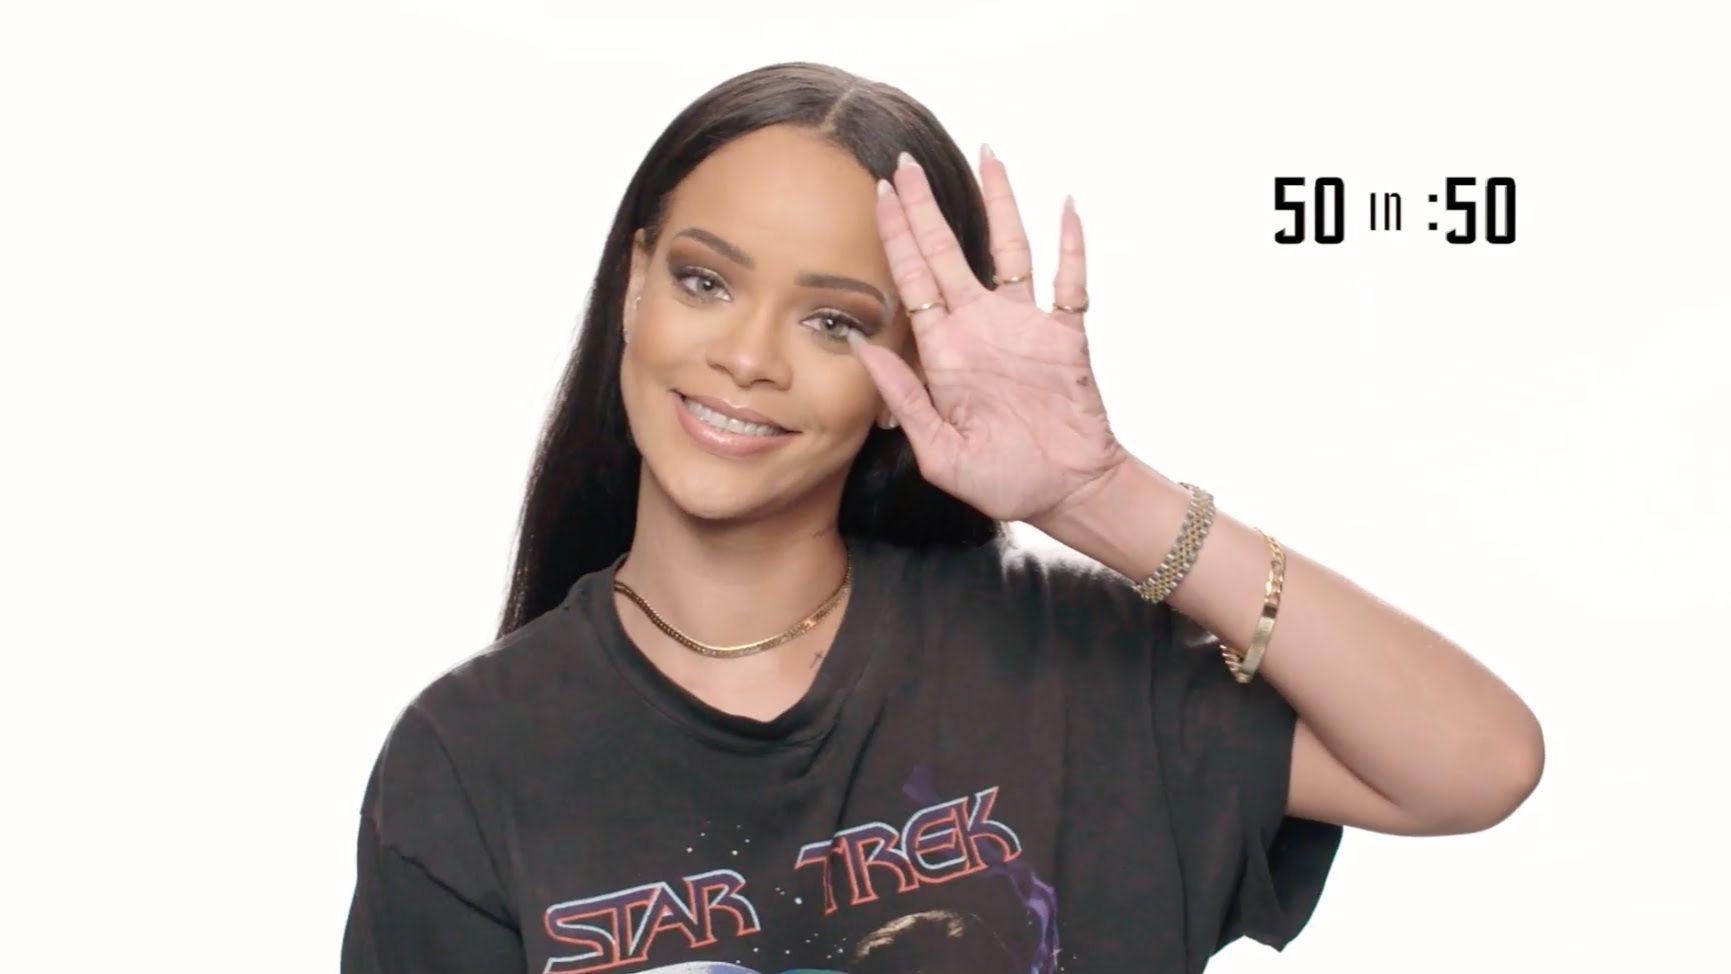 Star Trek Beyond (2016) – Rihanna 50 in :50 – Paramount Pictures